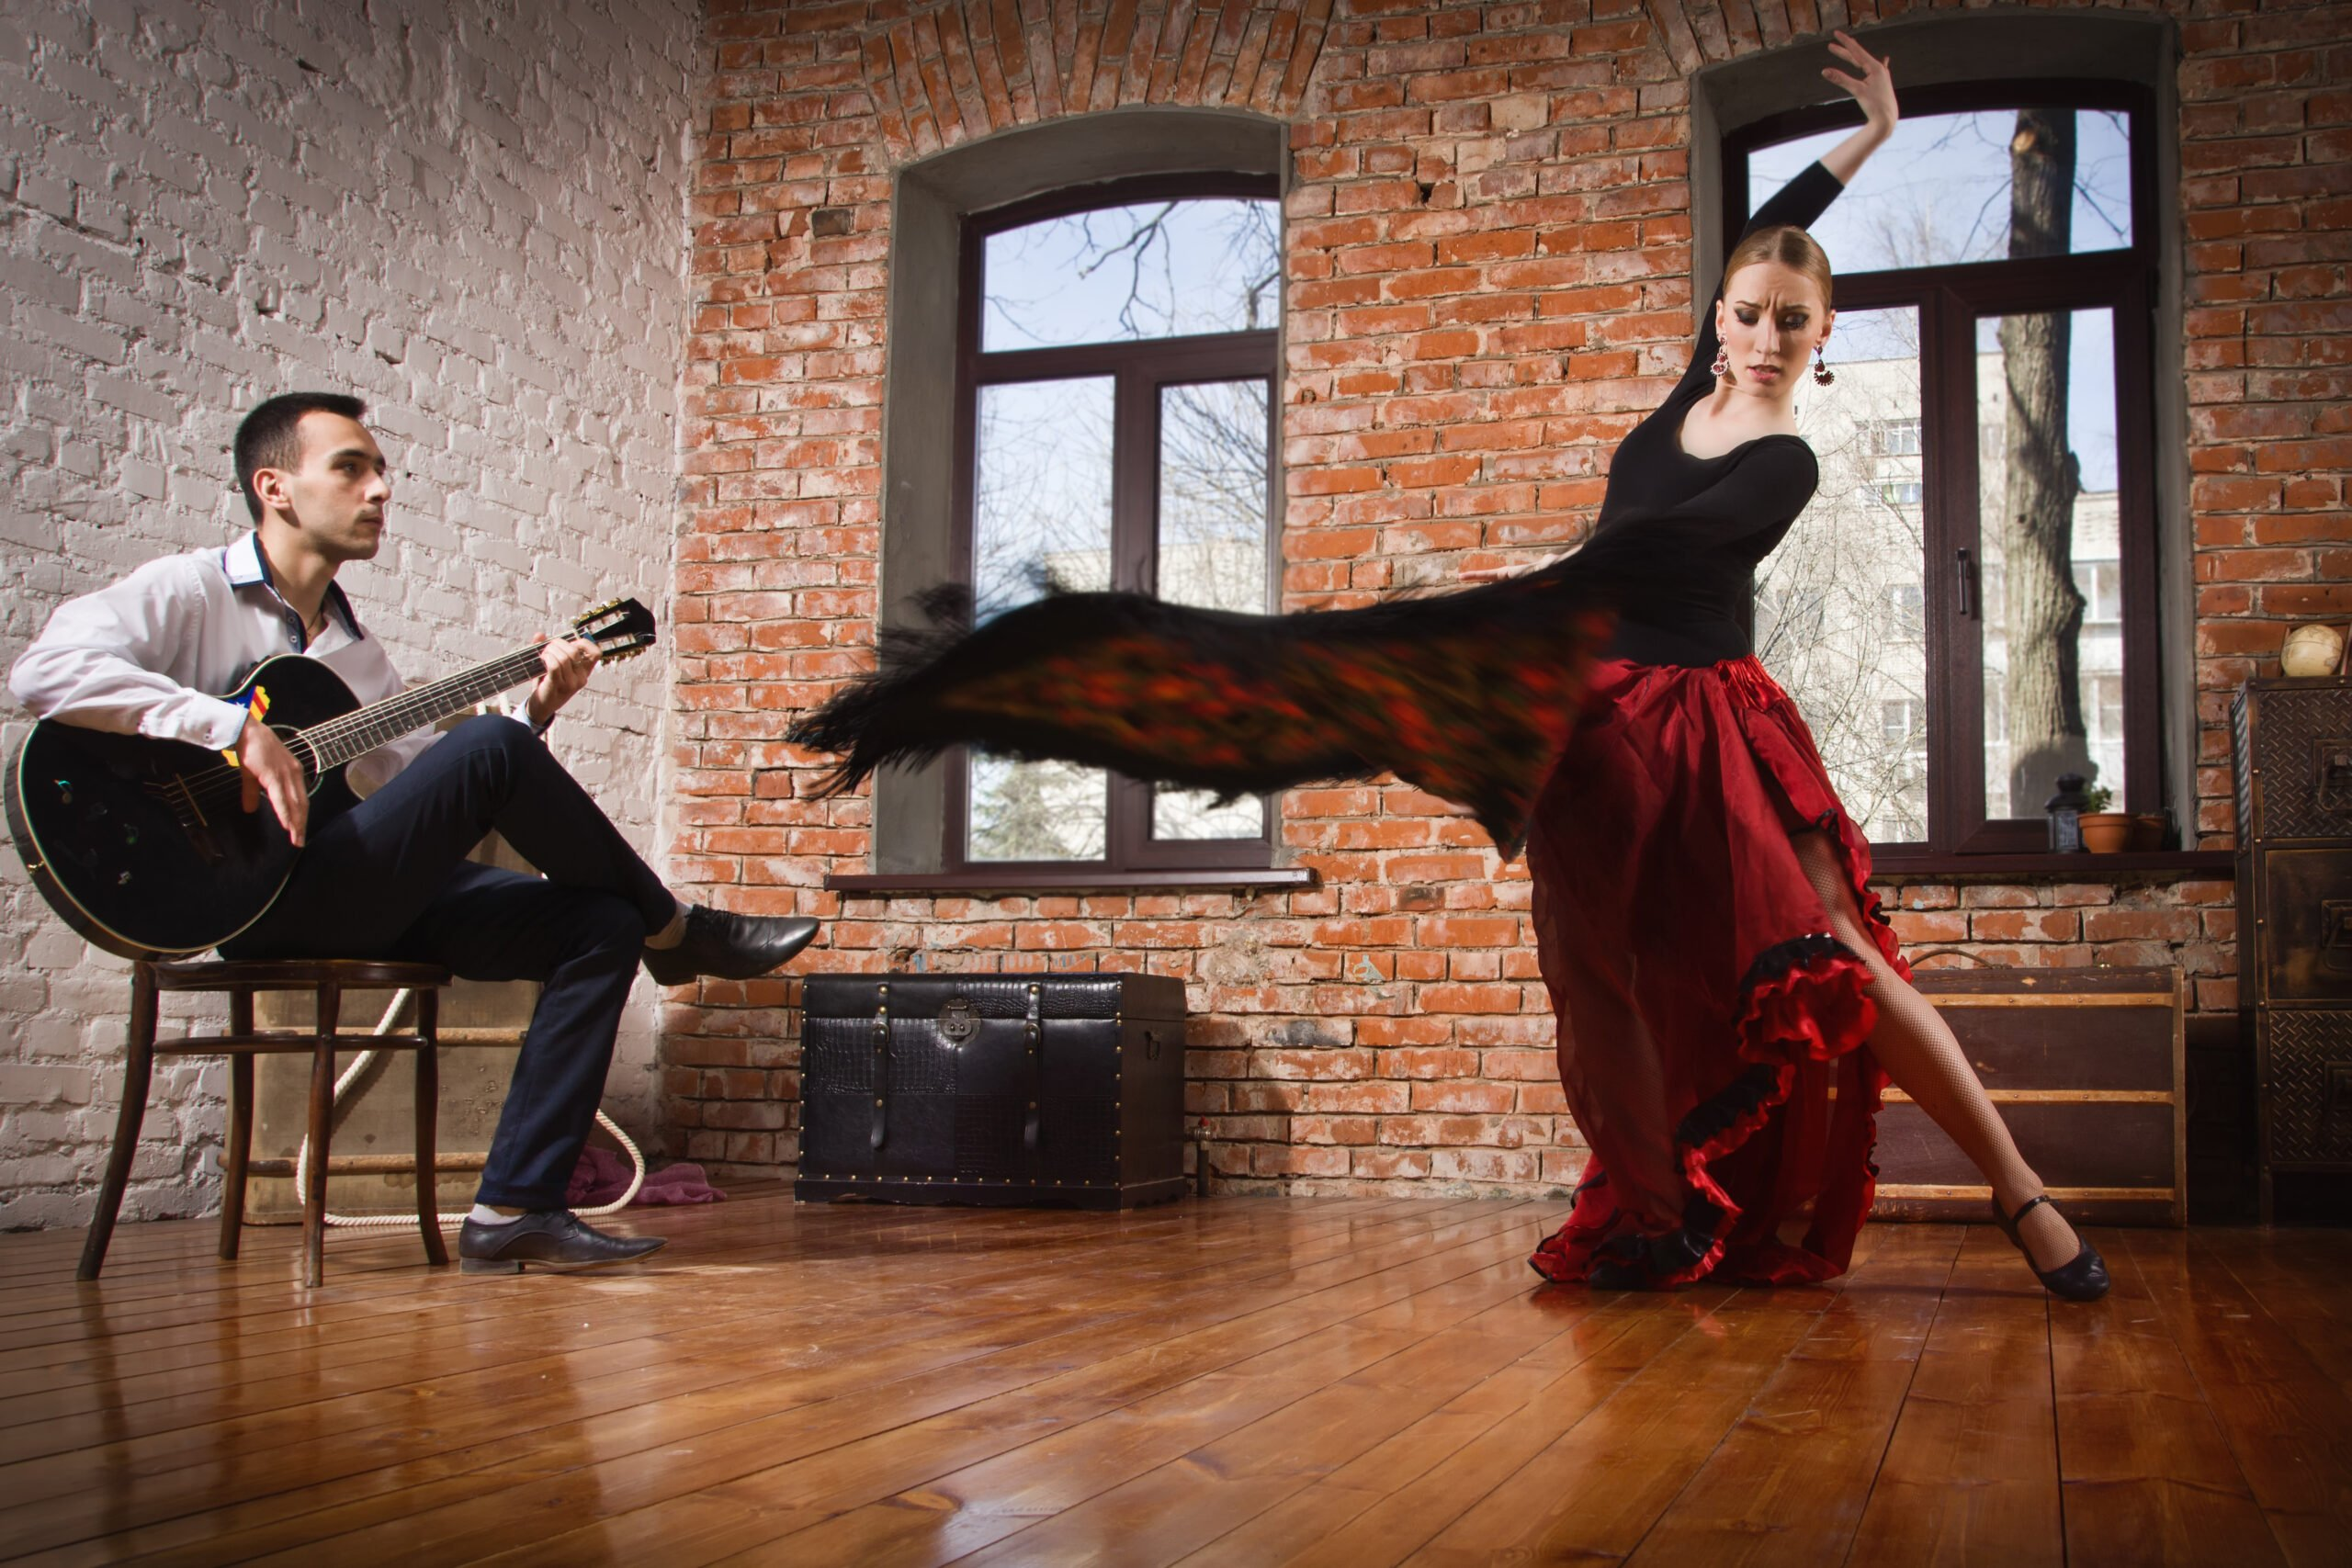 Enjoy A Traditional Flamenco Show On The Tapas Trail & Gypsy Flamenco Show In Granada